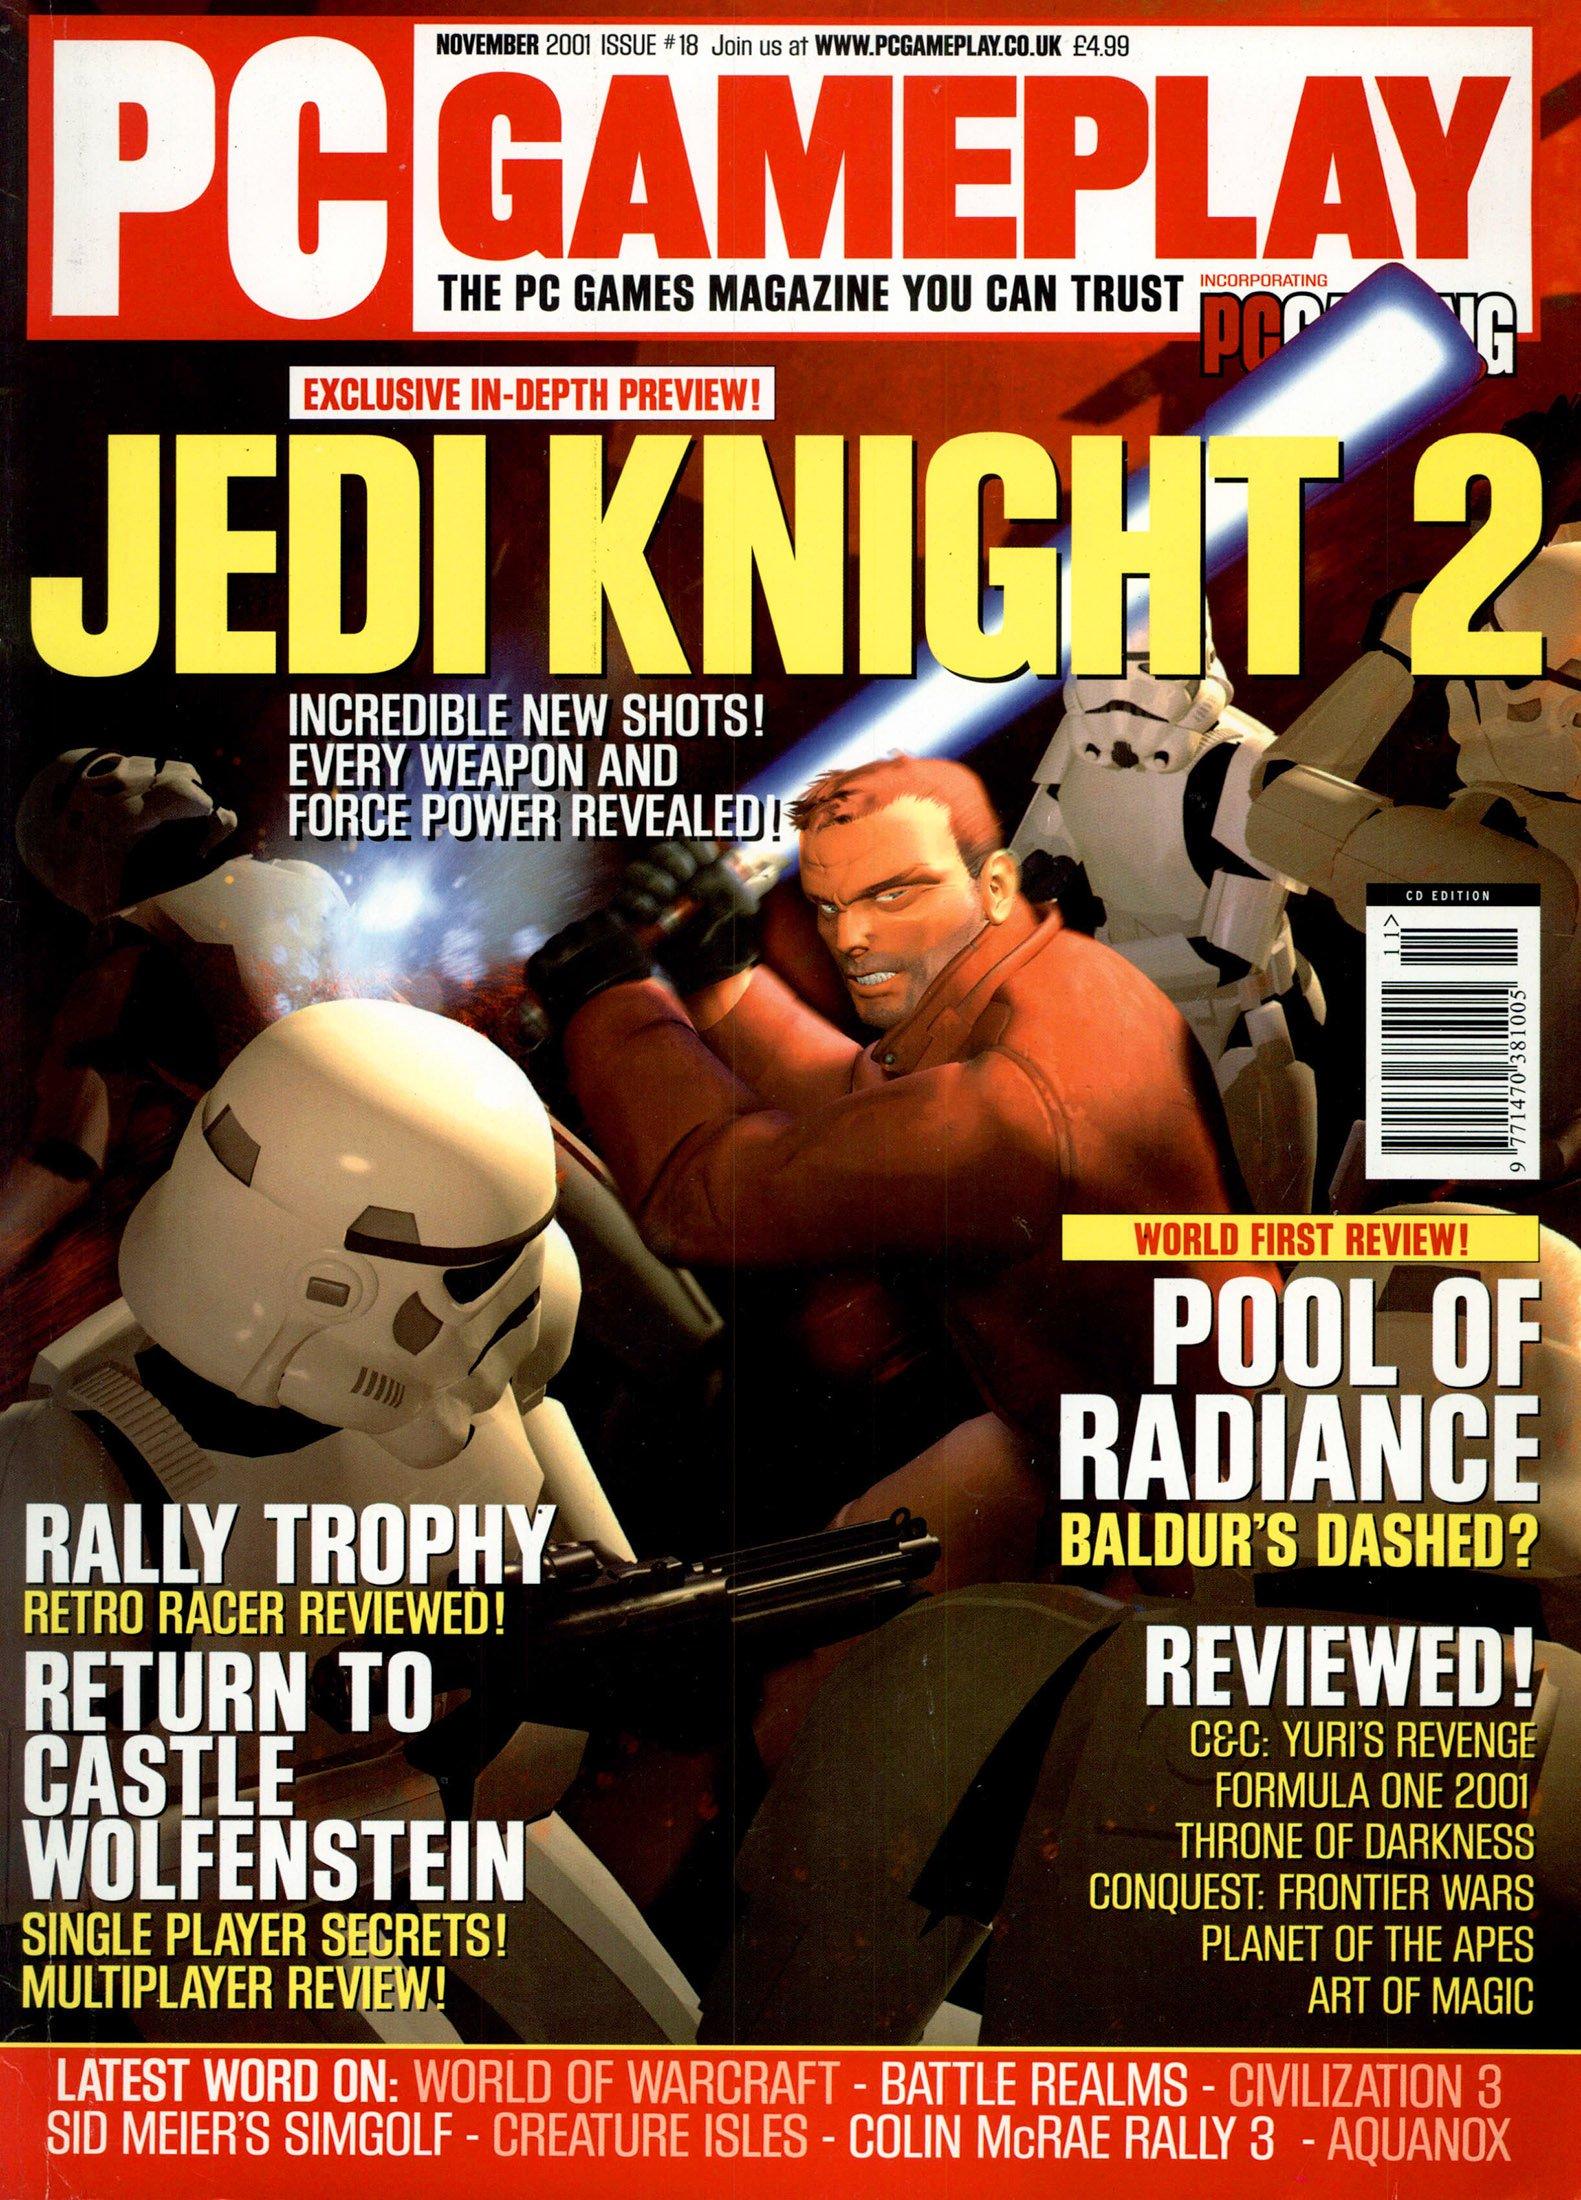 PC Gameplay Issue 18 (November 2001)